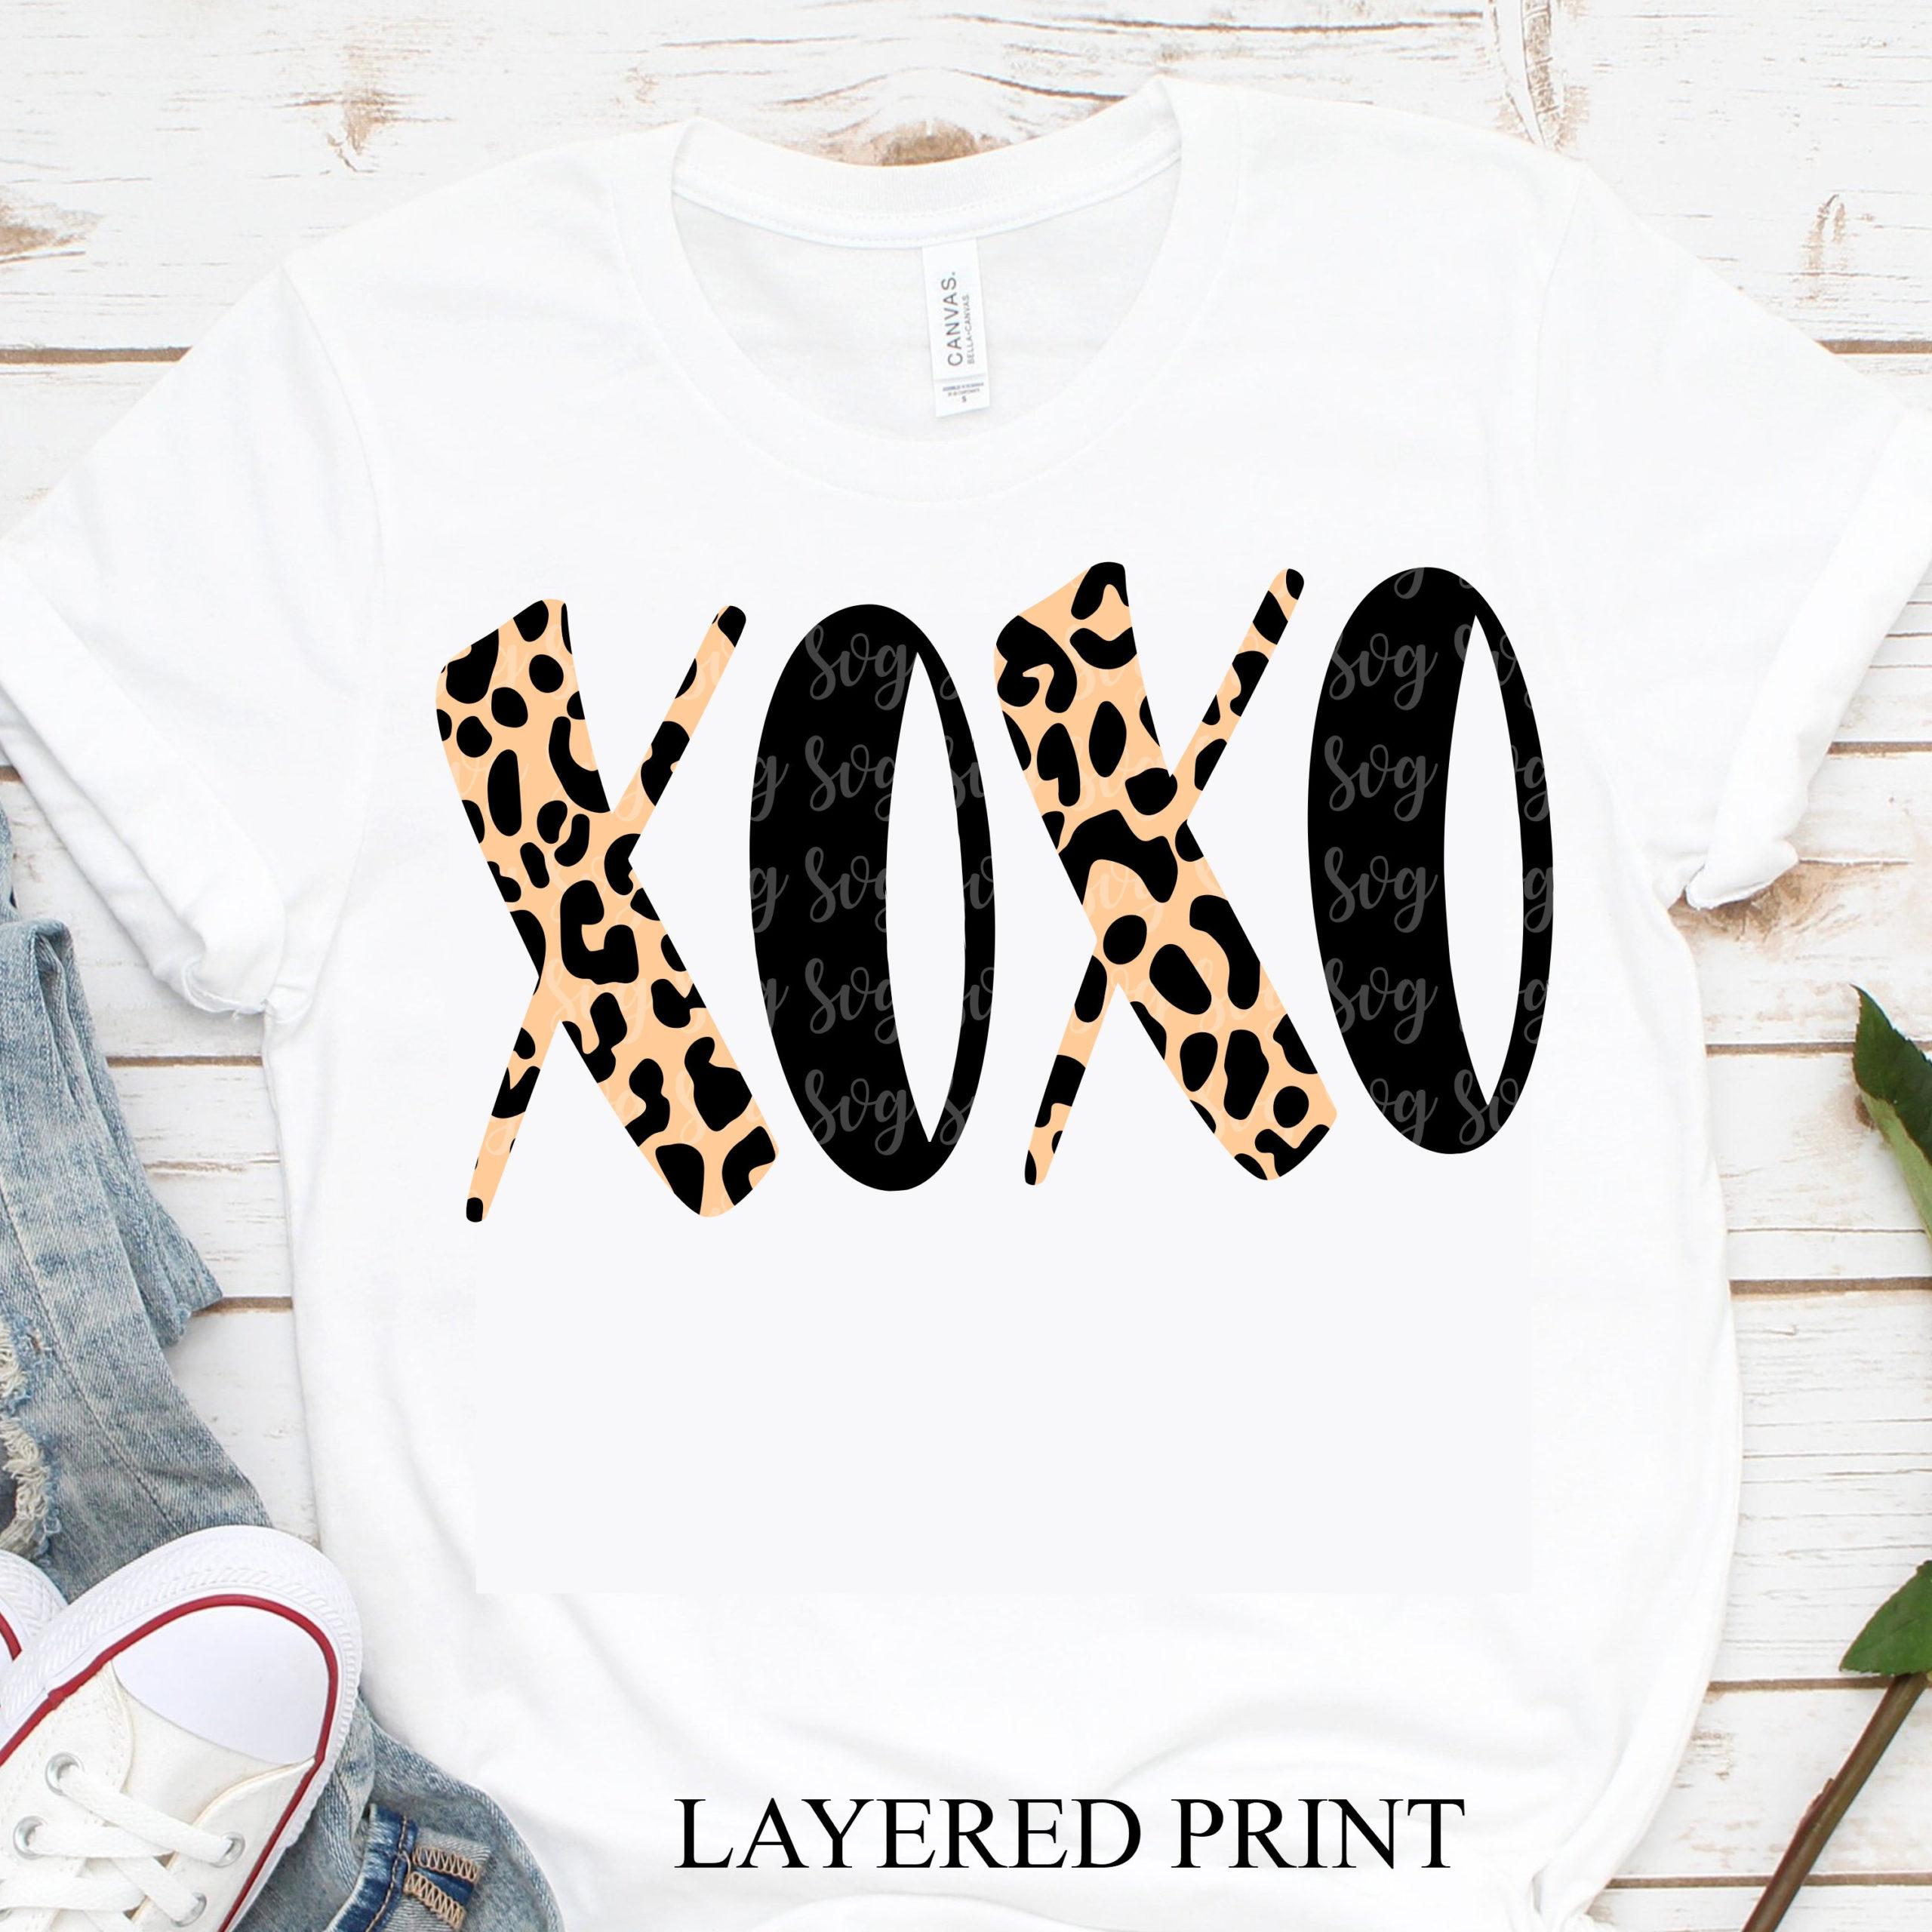 Leopard Print Xoxo Svg Valentine Xoxo Svg Valentine Svg Cheetah Print Svg Valentine Tshirt Svg Svg For Cricut Xoxo Svg Leopard Print Svg Svg For Cricut